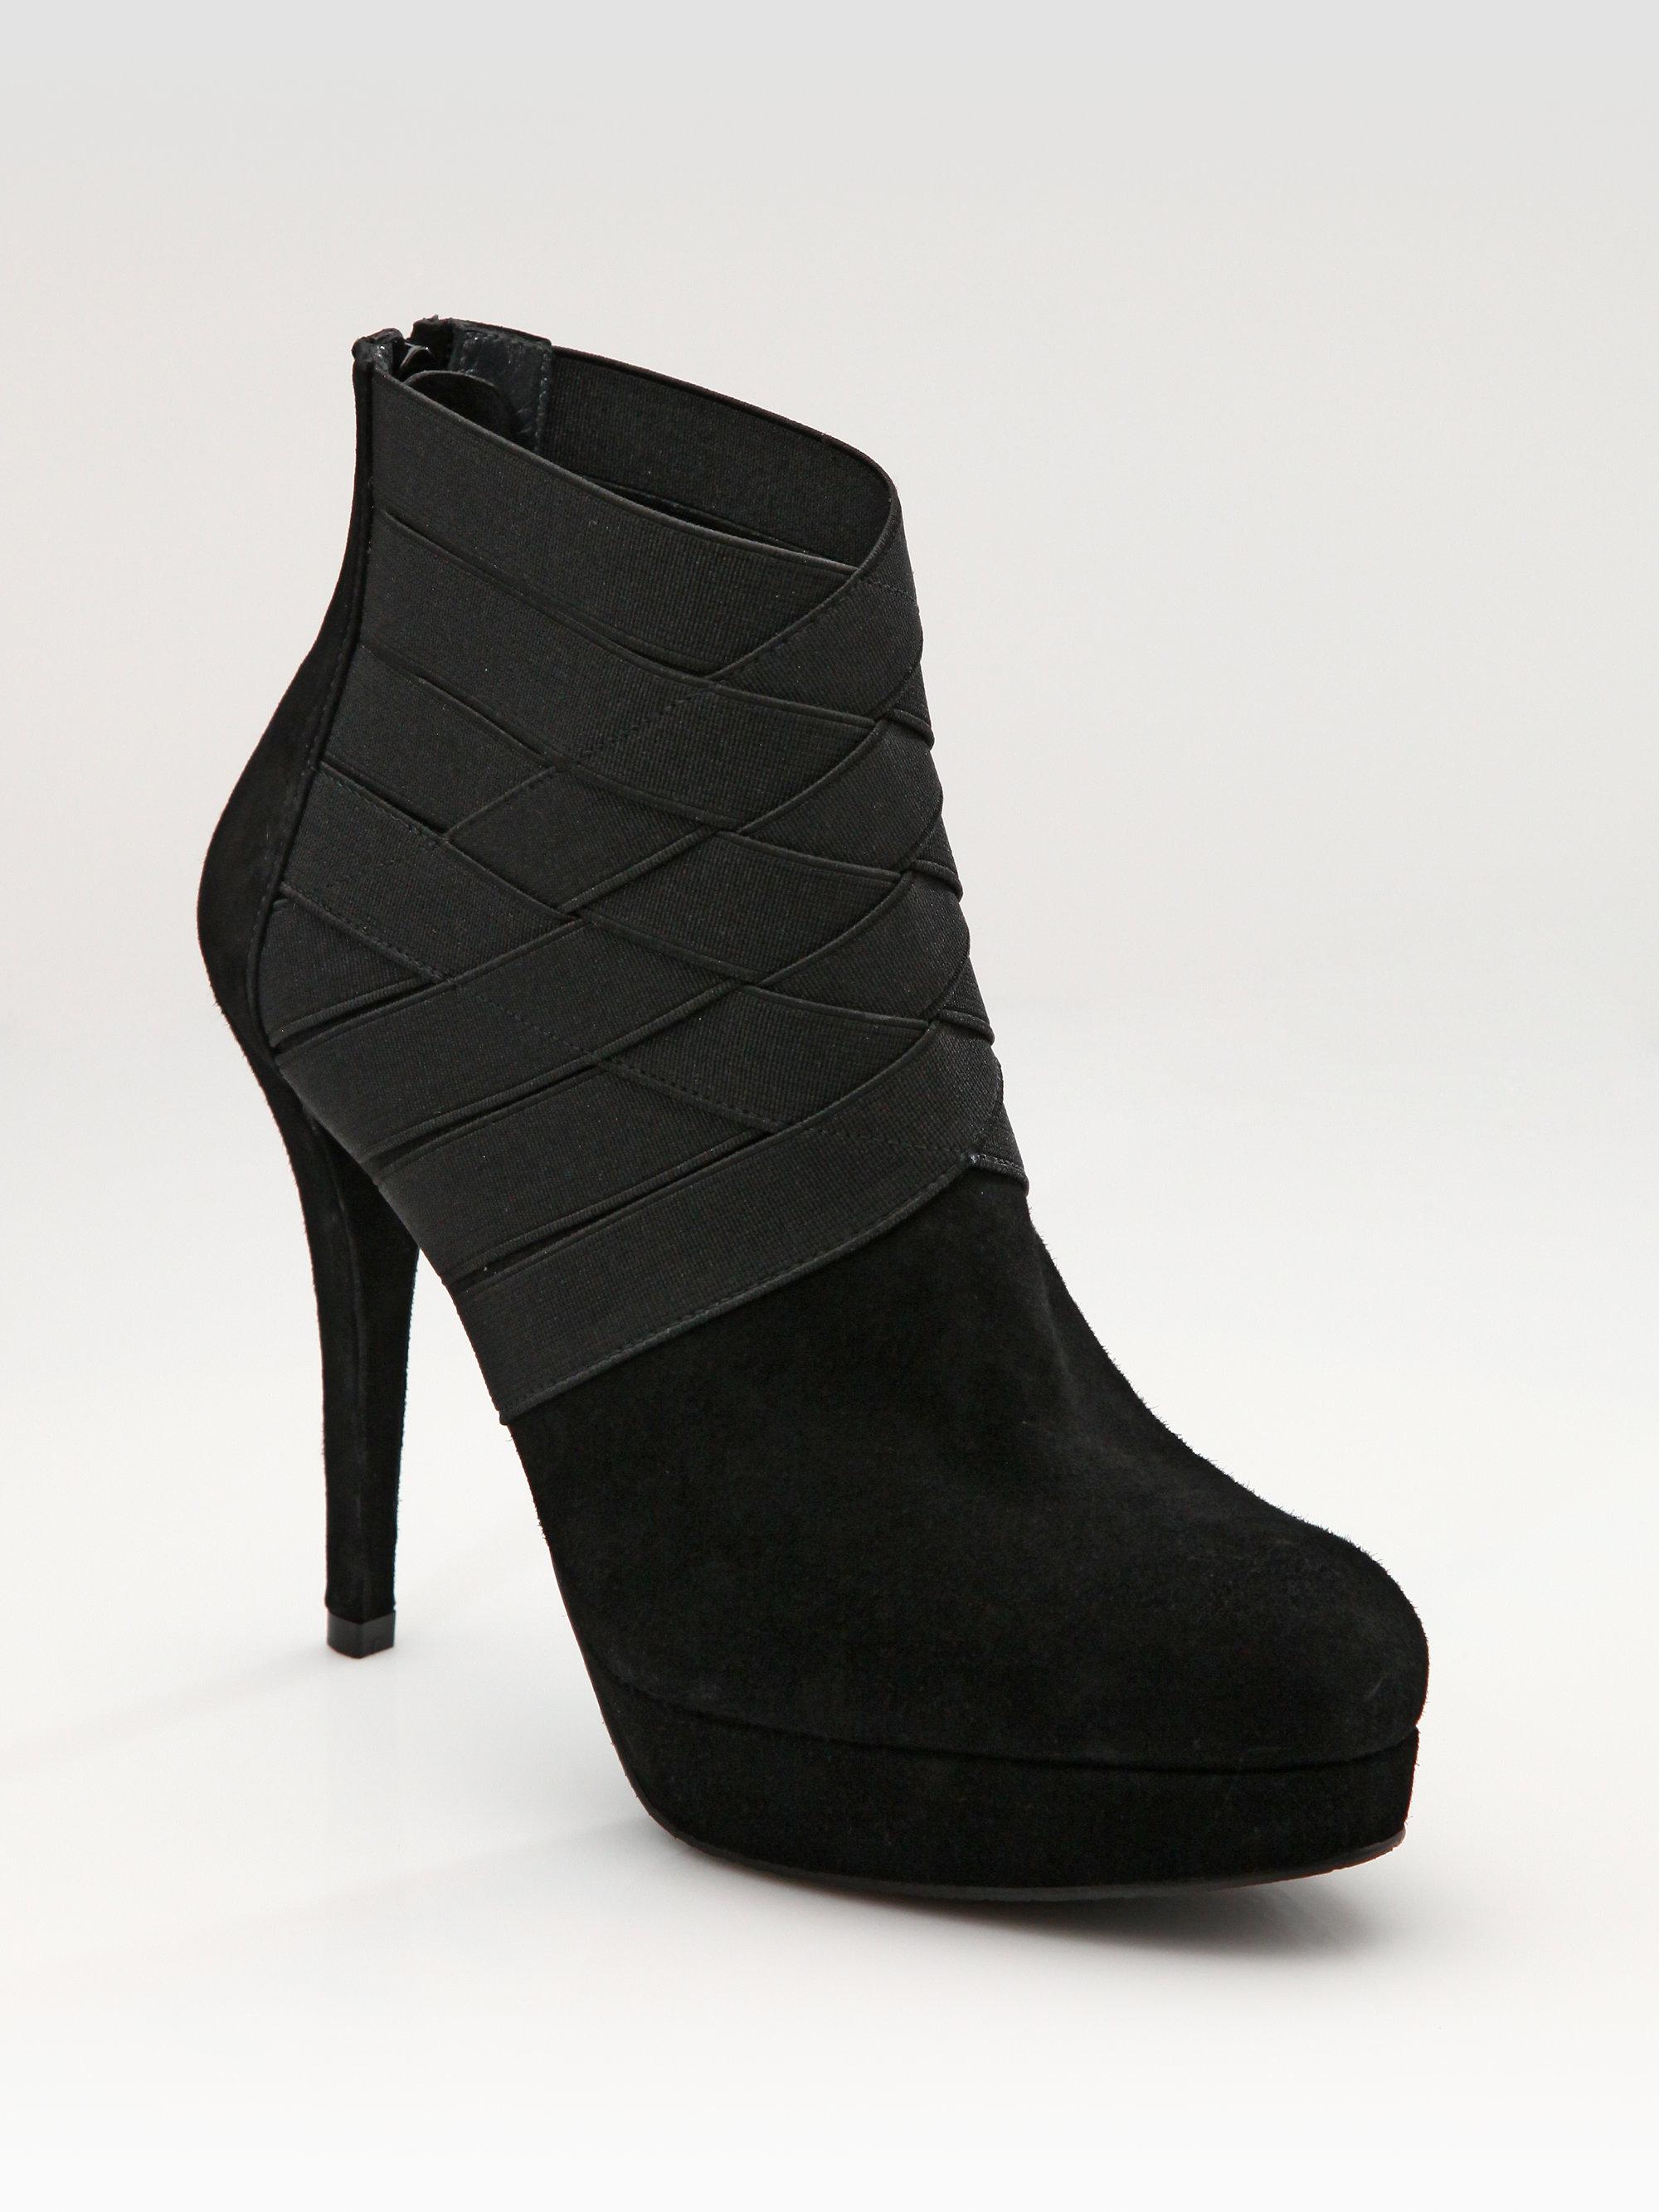 67edb4036d68 stuart-weitzman-black-papoose-suede-ankle-boots -product-1-7503474-289629540.jpeg